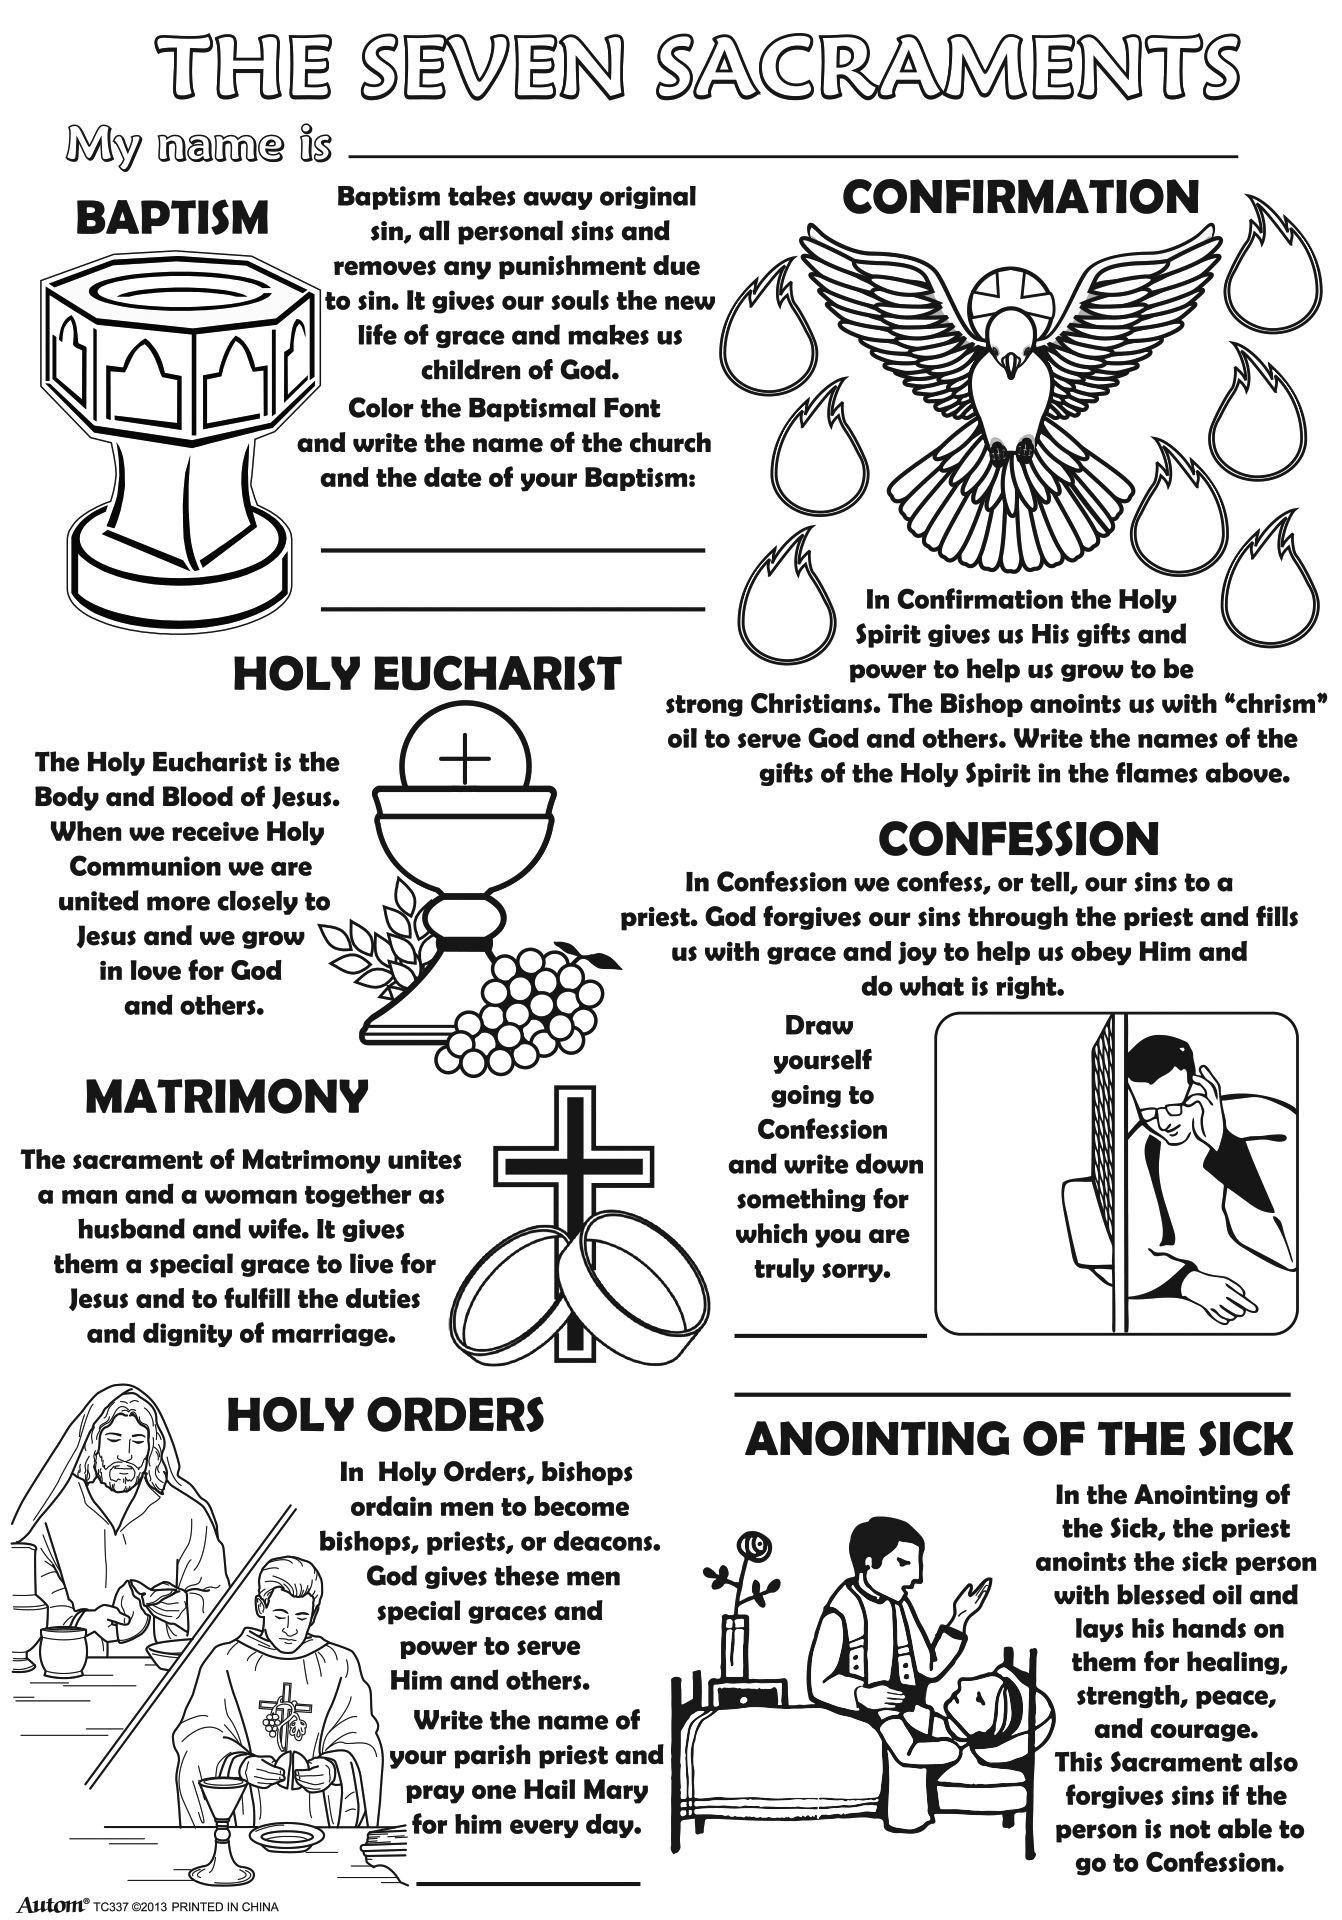 Pin On Holy Sacraments Established By Jesus